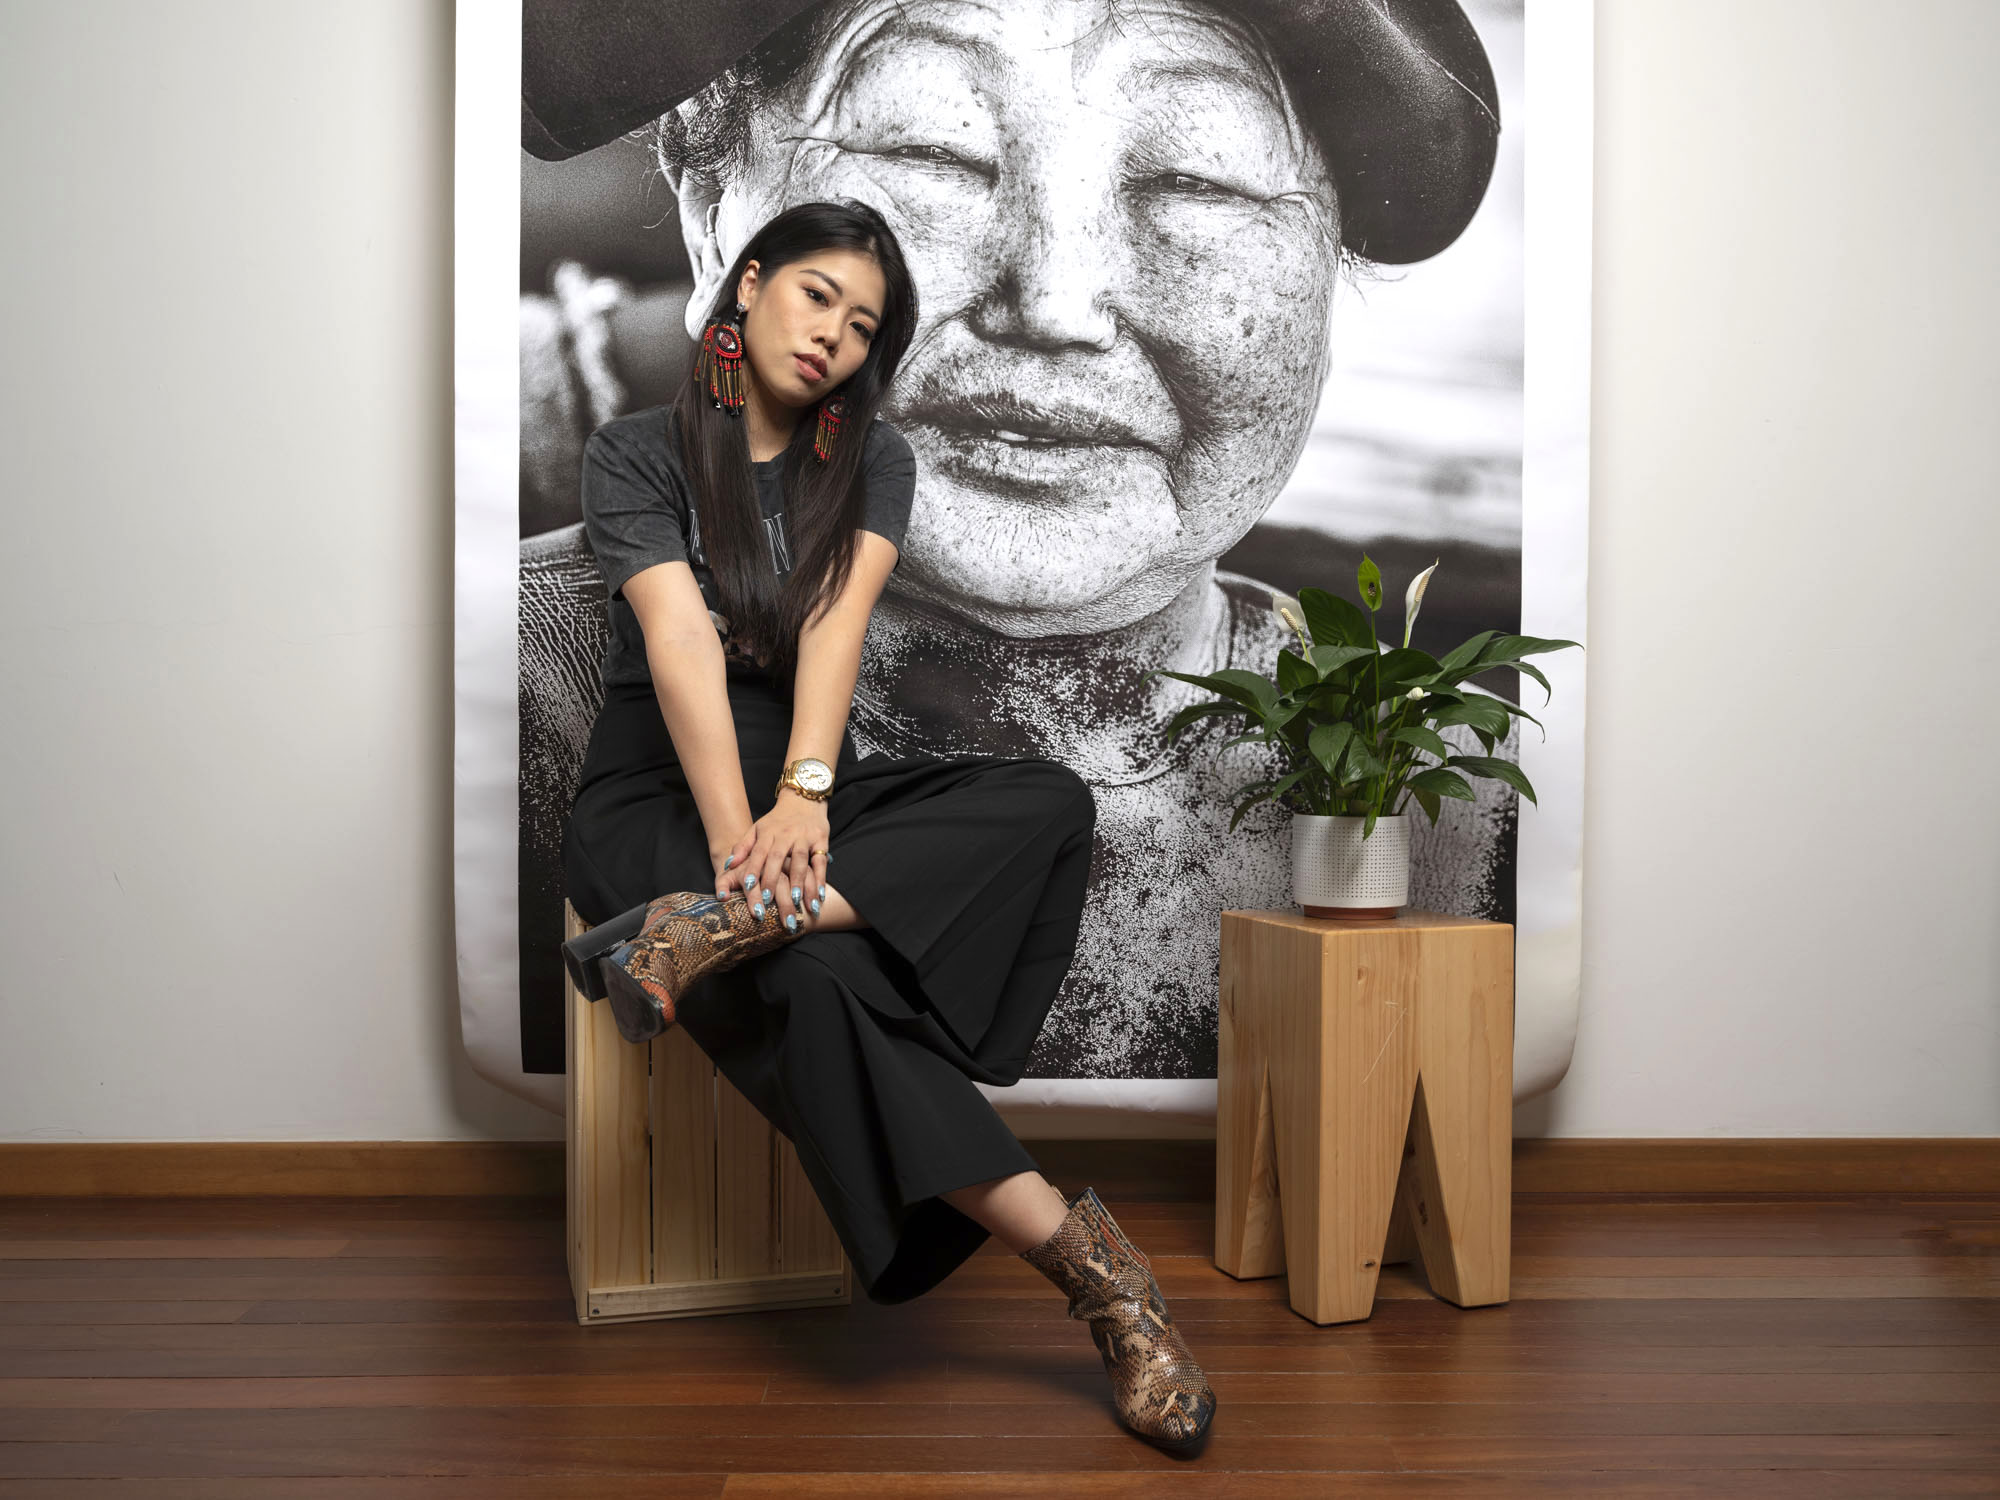 Corporate headshot portrait linkedin profil photography studio singapore services asia photographer print 1